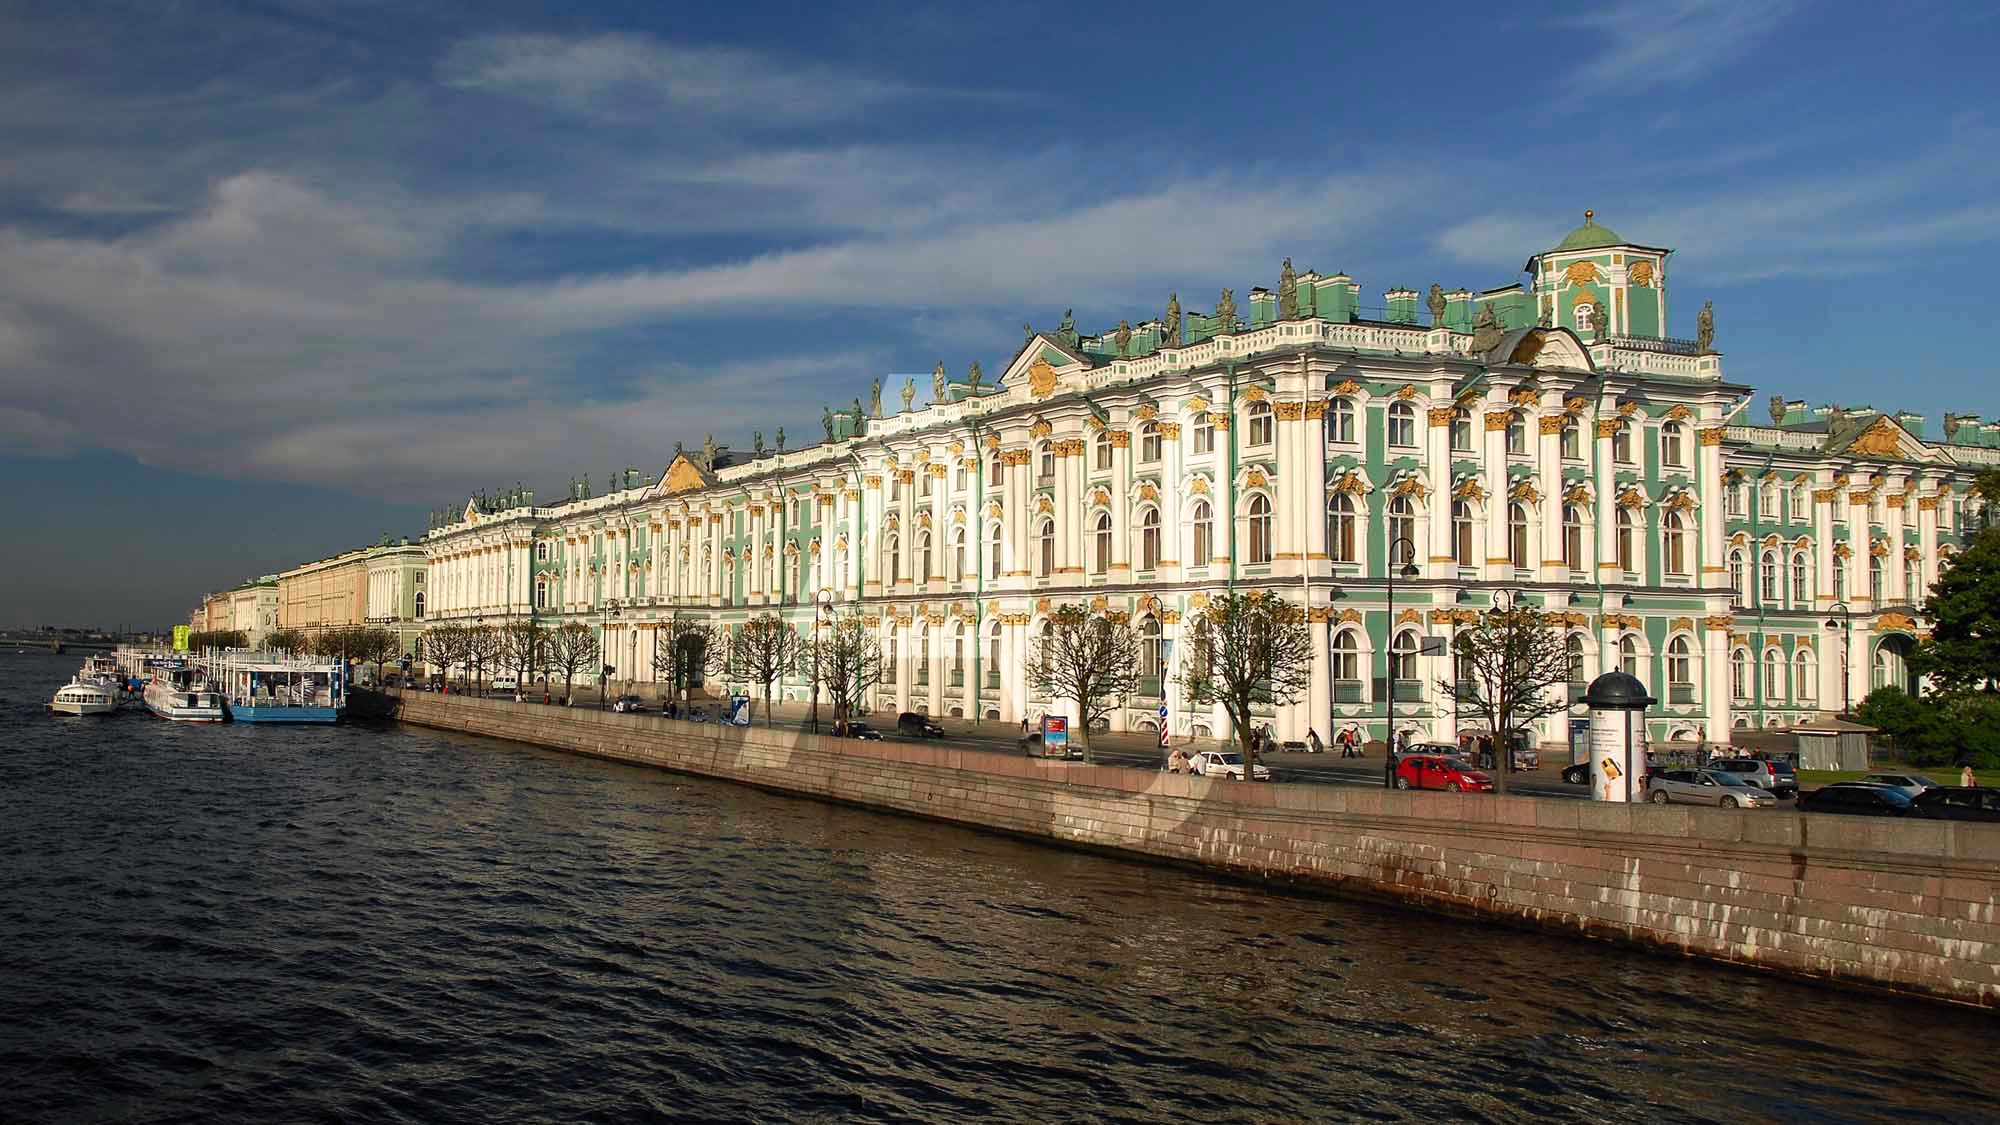 <i>Eremitage, Sankt Petersburg (Russia)</i>